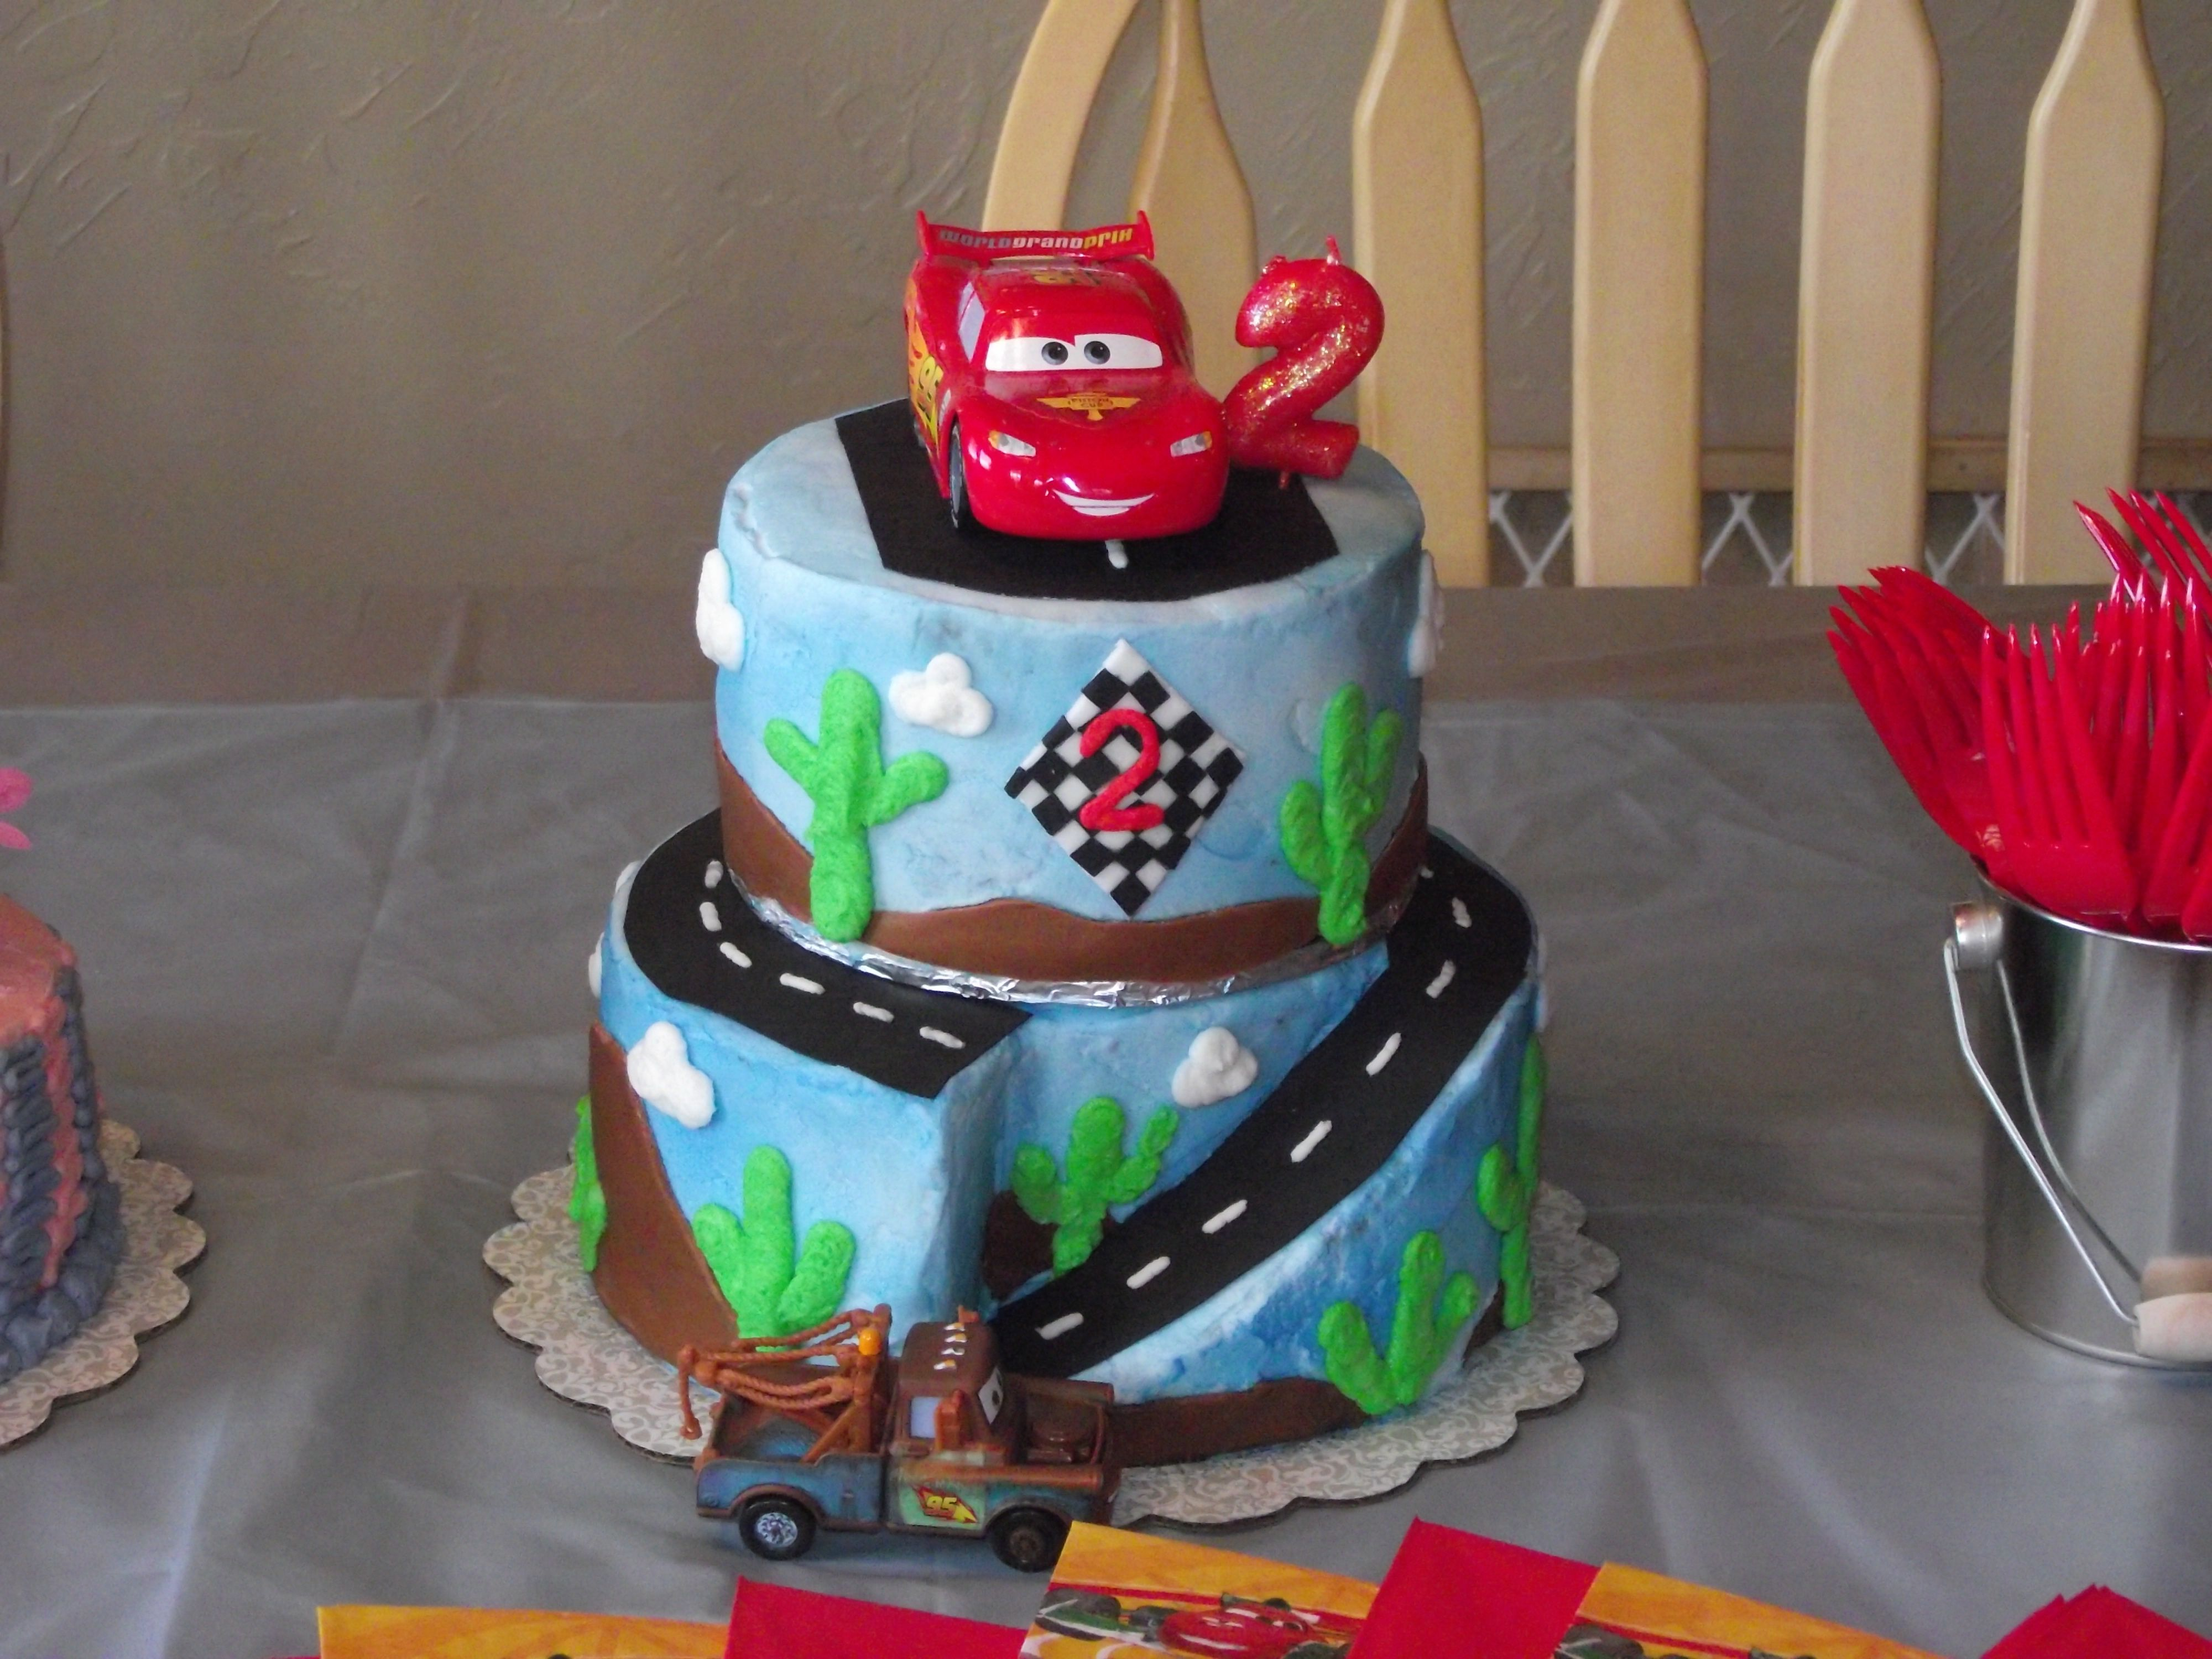 Pleasing My Little Boys 2Nd Birthday Cake Birthday Cake Kids Image Funny Birthday Cards Online Inifofree Goldxyz